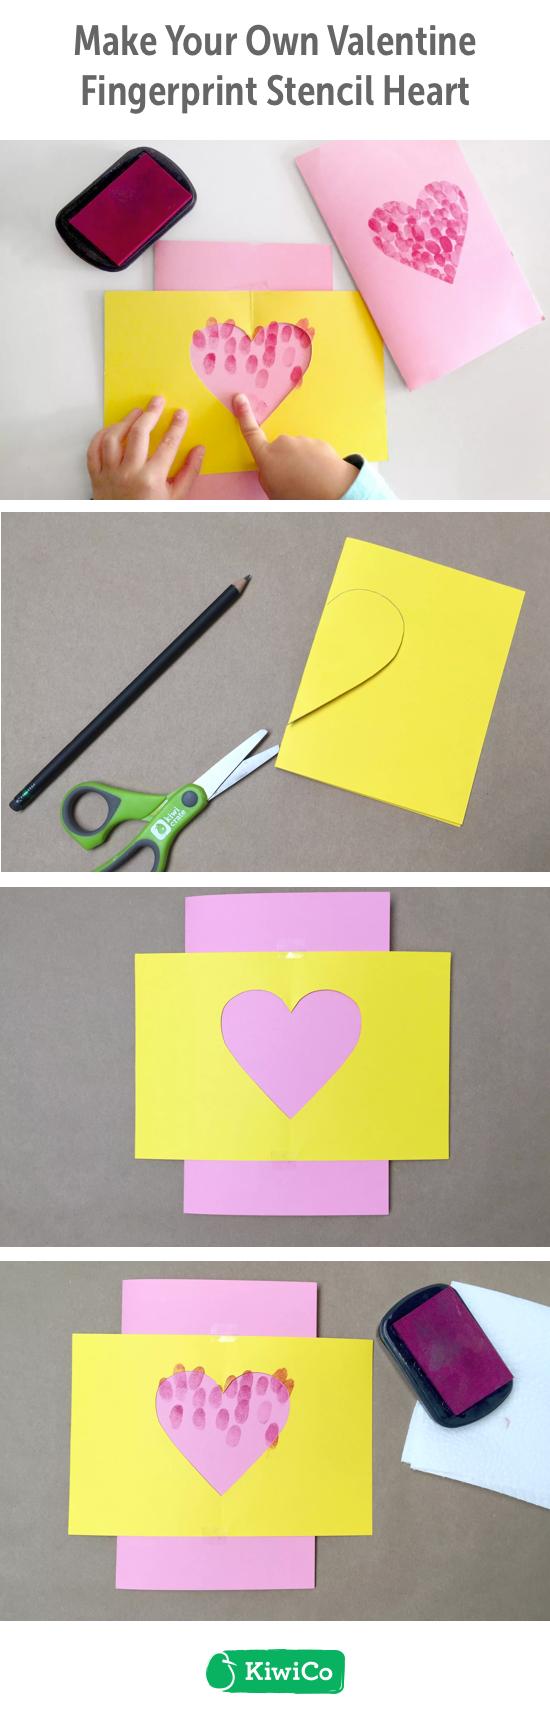 Valentine fingerprint stencil heart diy this do it yourself paper valentine fingerprint stencil heart diy this do it yourself paper craft is great solutioingenieria Choice Image